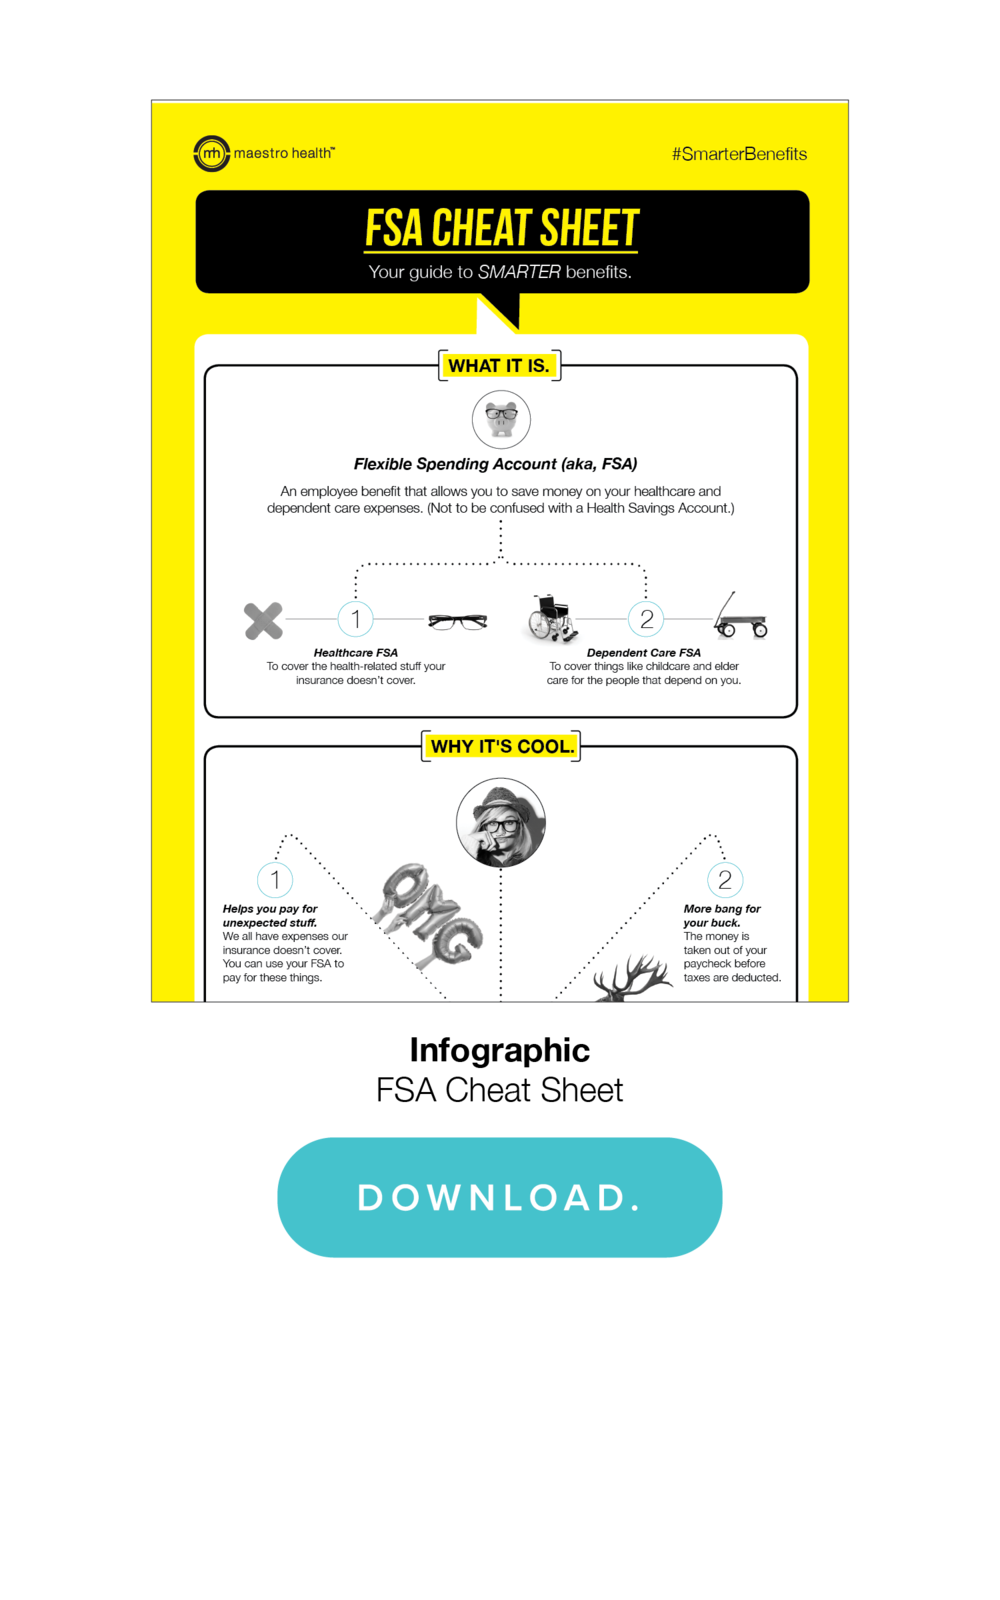 LandingPage_JulyBenAccts_Webinar_Imagery_Infographics_082217_r93.png